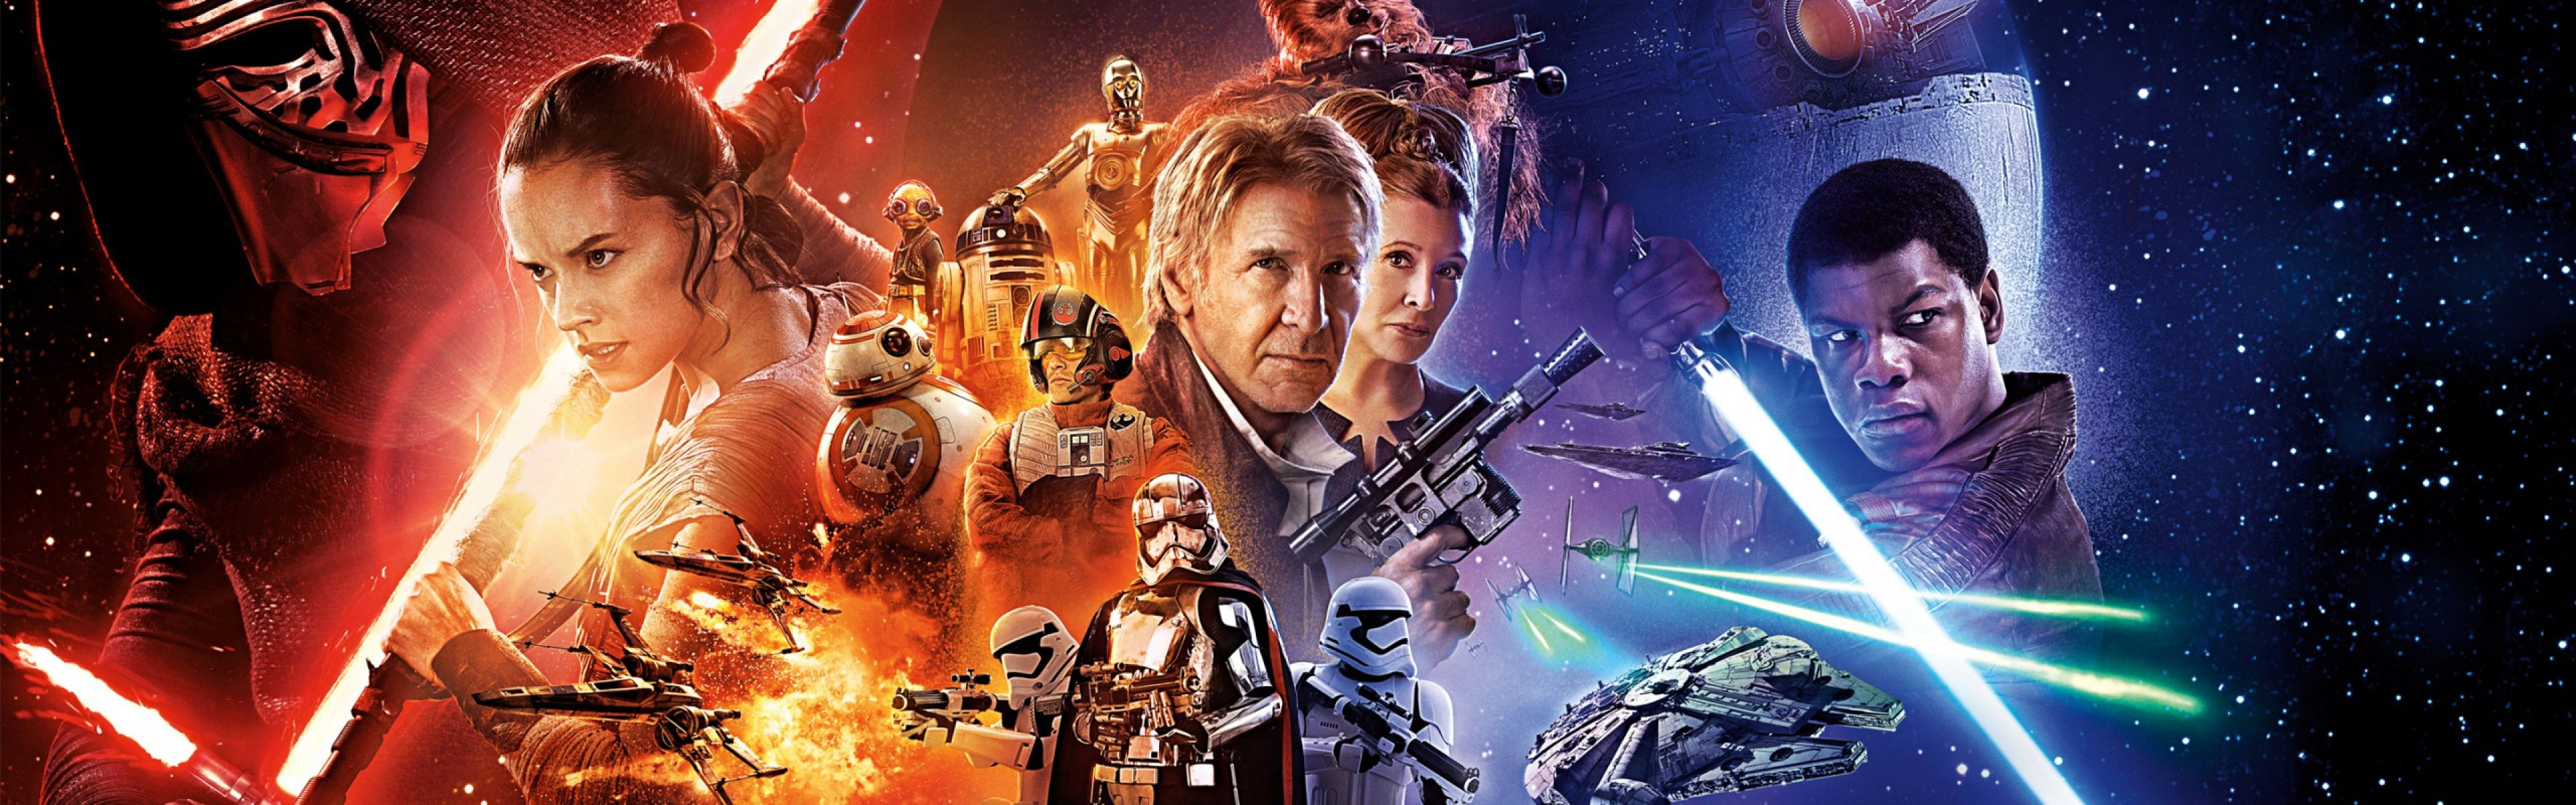 Dual Wide Star Wars Wallpapers Hd Desktop Backgrounds 3840x1200 Star Wars Poster Force Awakens Poster Star Wars Episodes